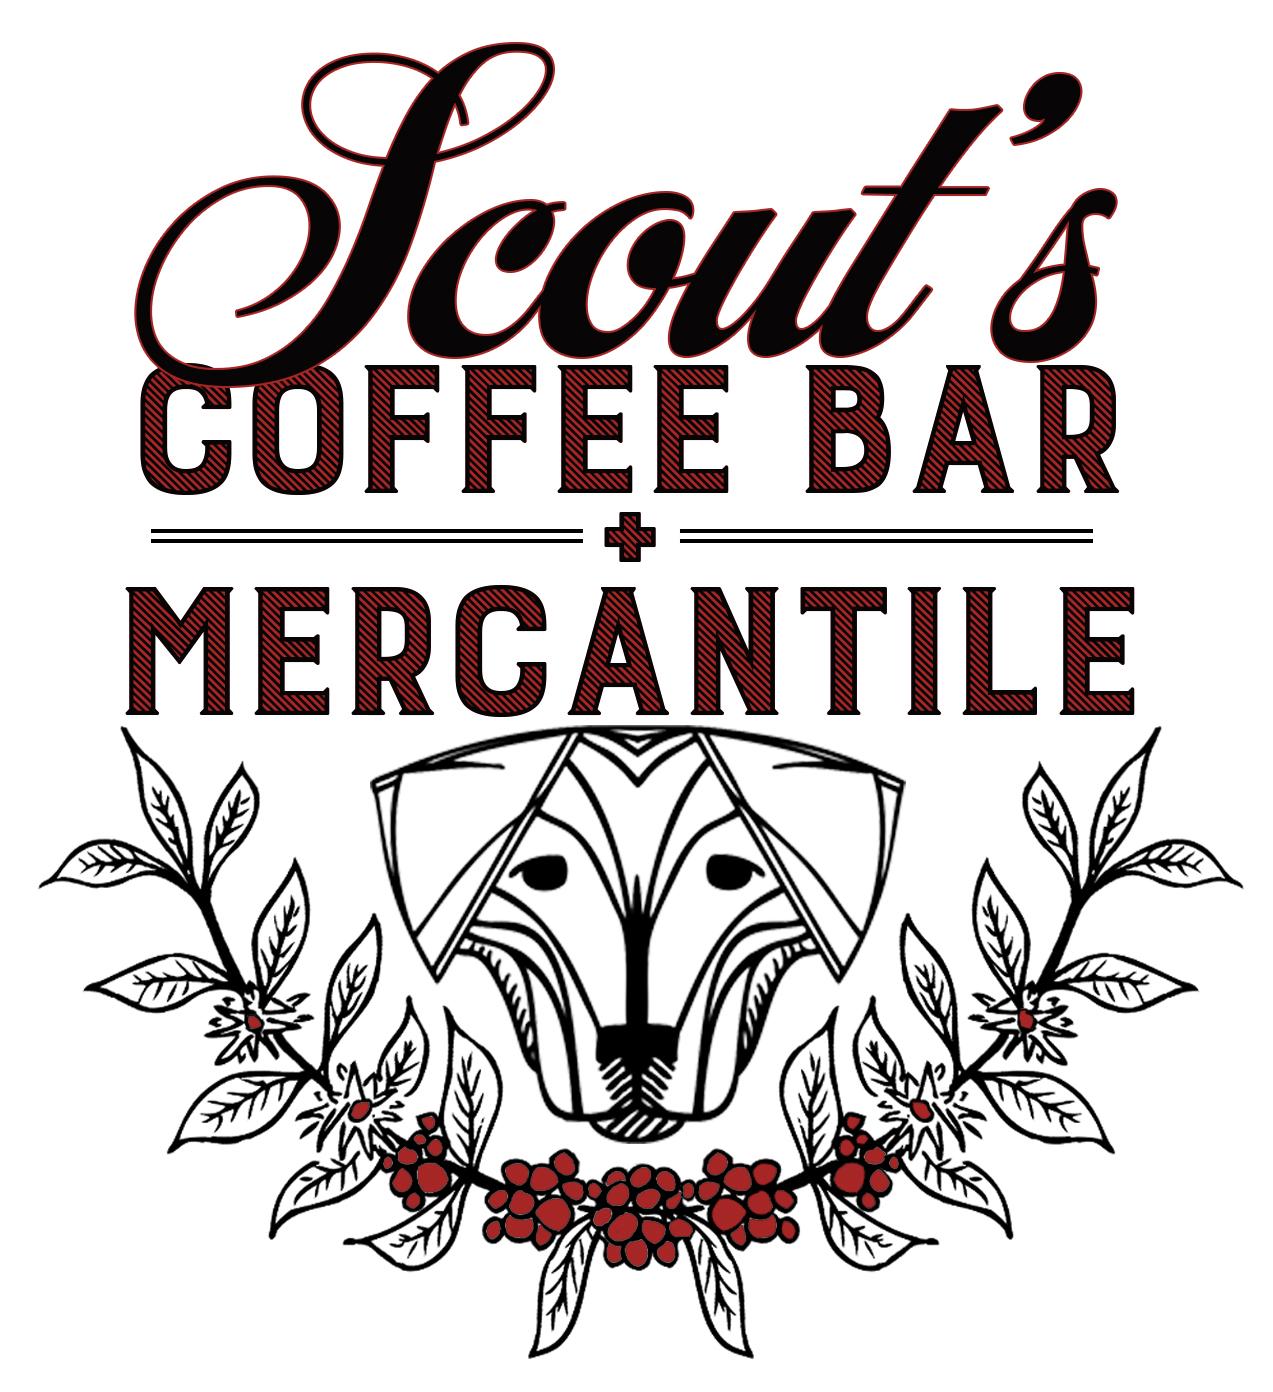 Scout's Coffee Bar & Mercantile, High Bridge, NJ